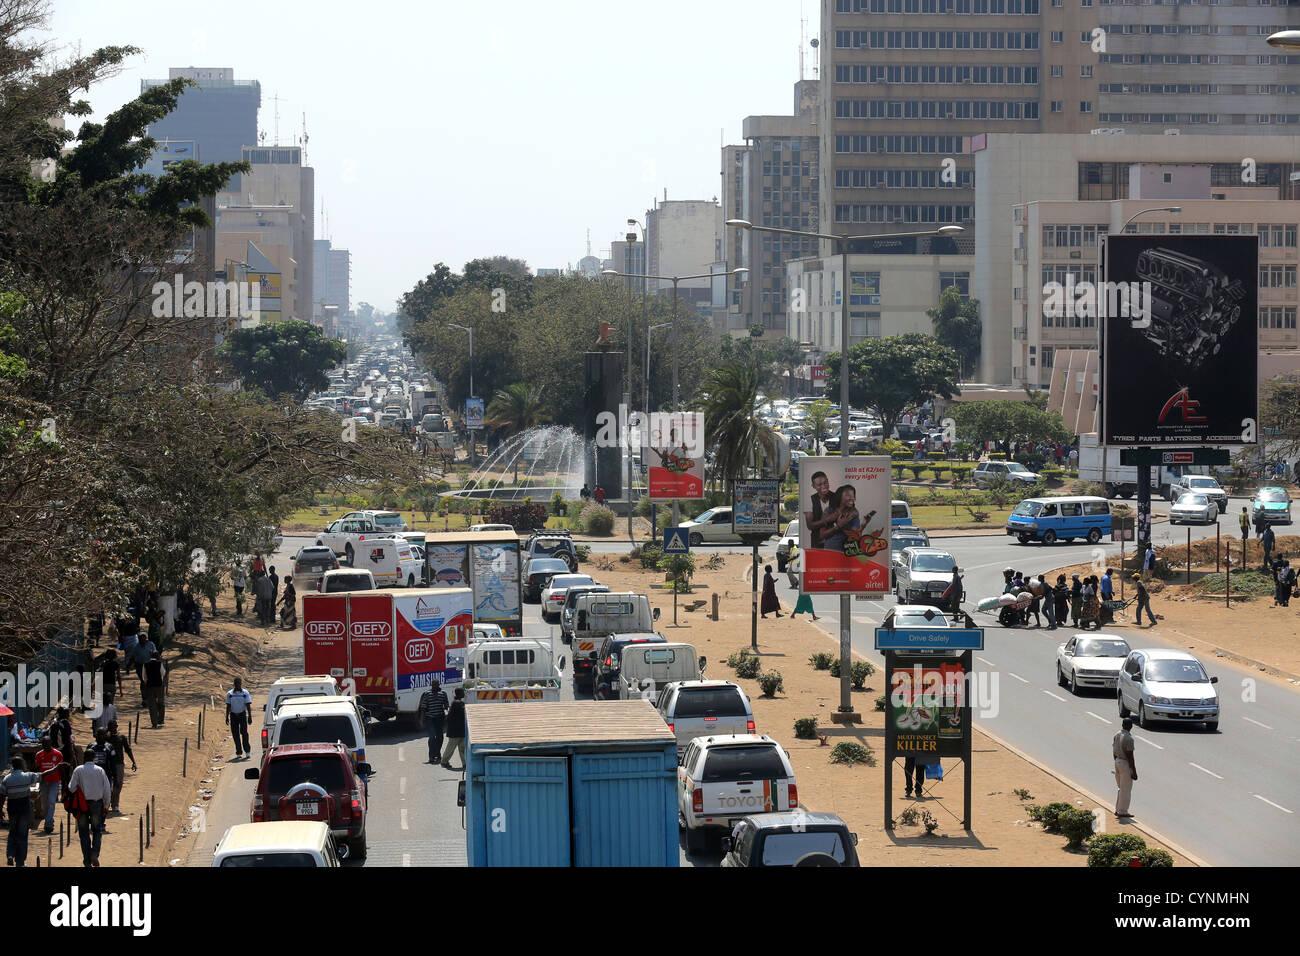 Cairo road, downtown Lusaka, capital of Zambia. - Stock Image